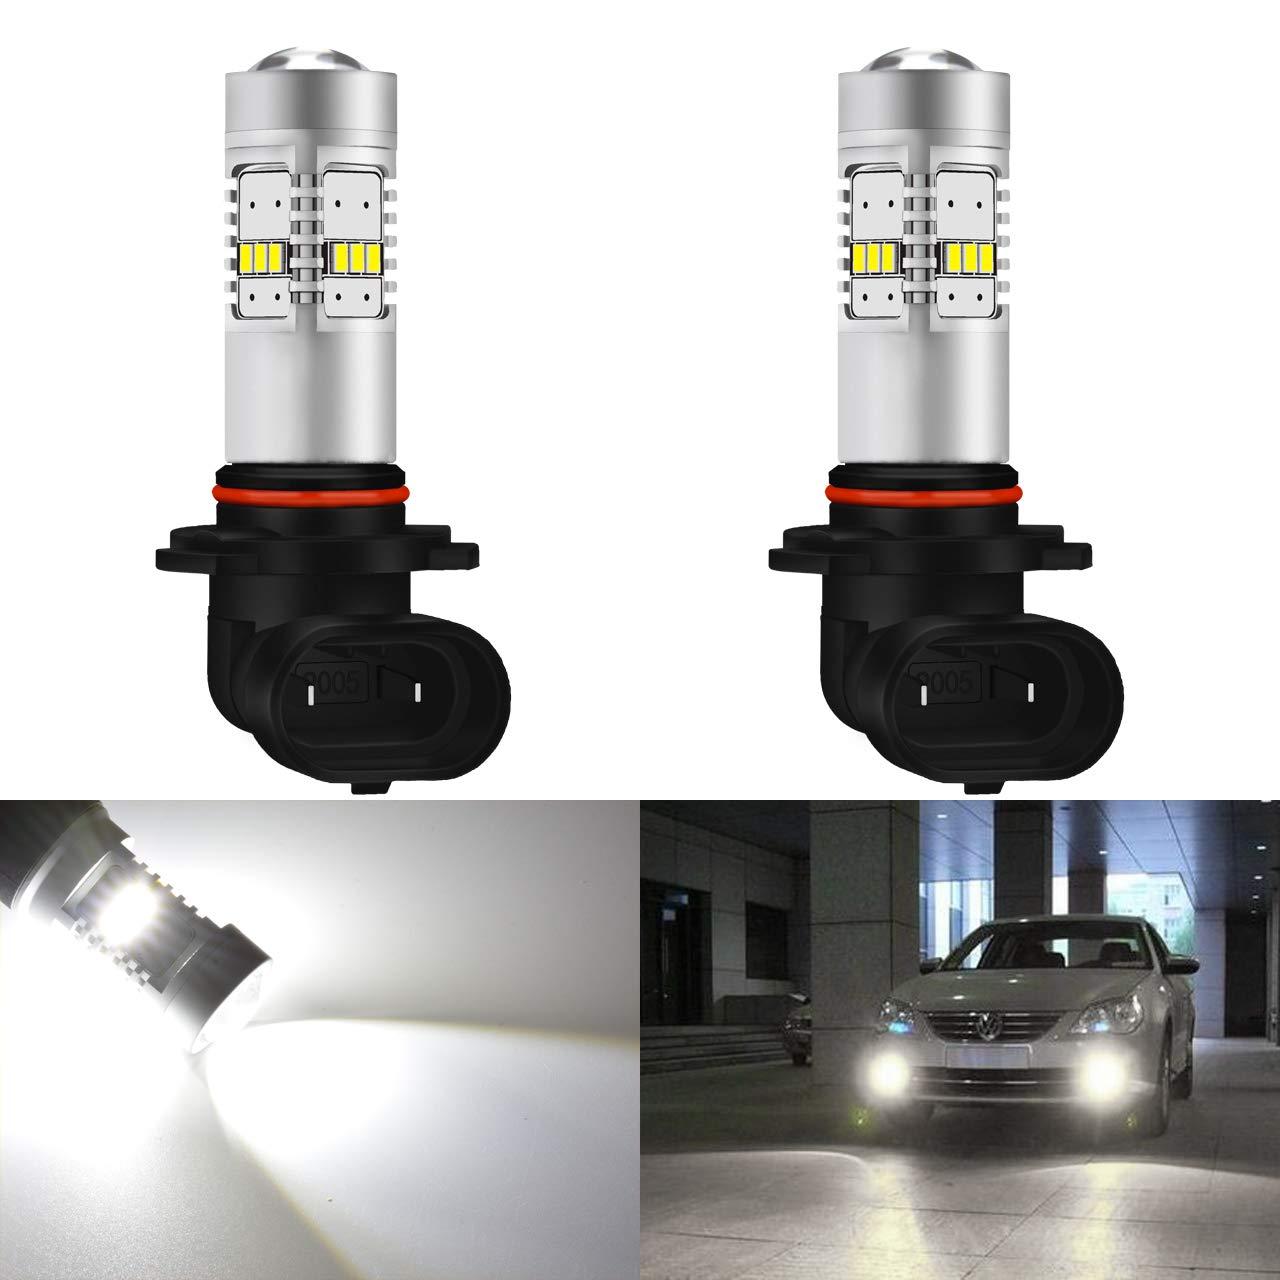 KaTur 2pcs 1800LM Extremely Bright 9005/HB3 Fog Drving Light DRL Fog Light, 360 Degree Led Car Driving Light Fit for Daytime Running Light or Fog Lights Replacement White